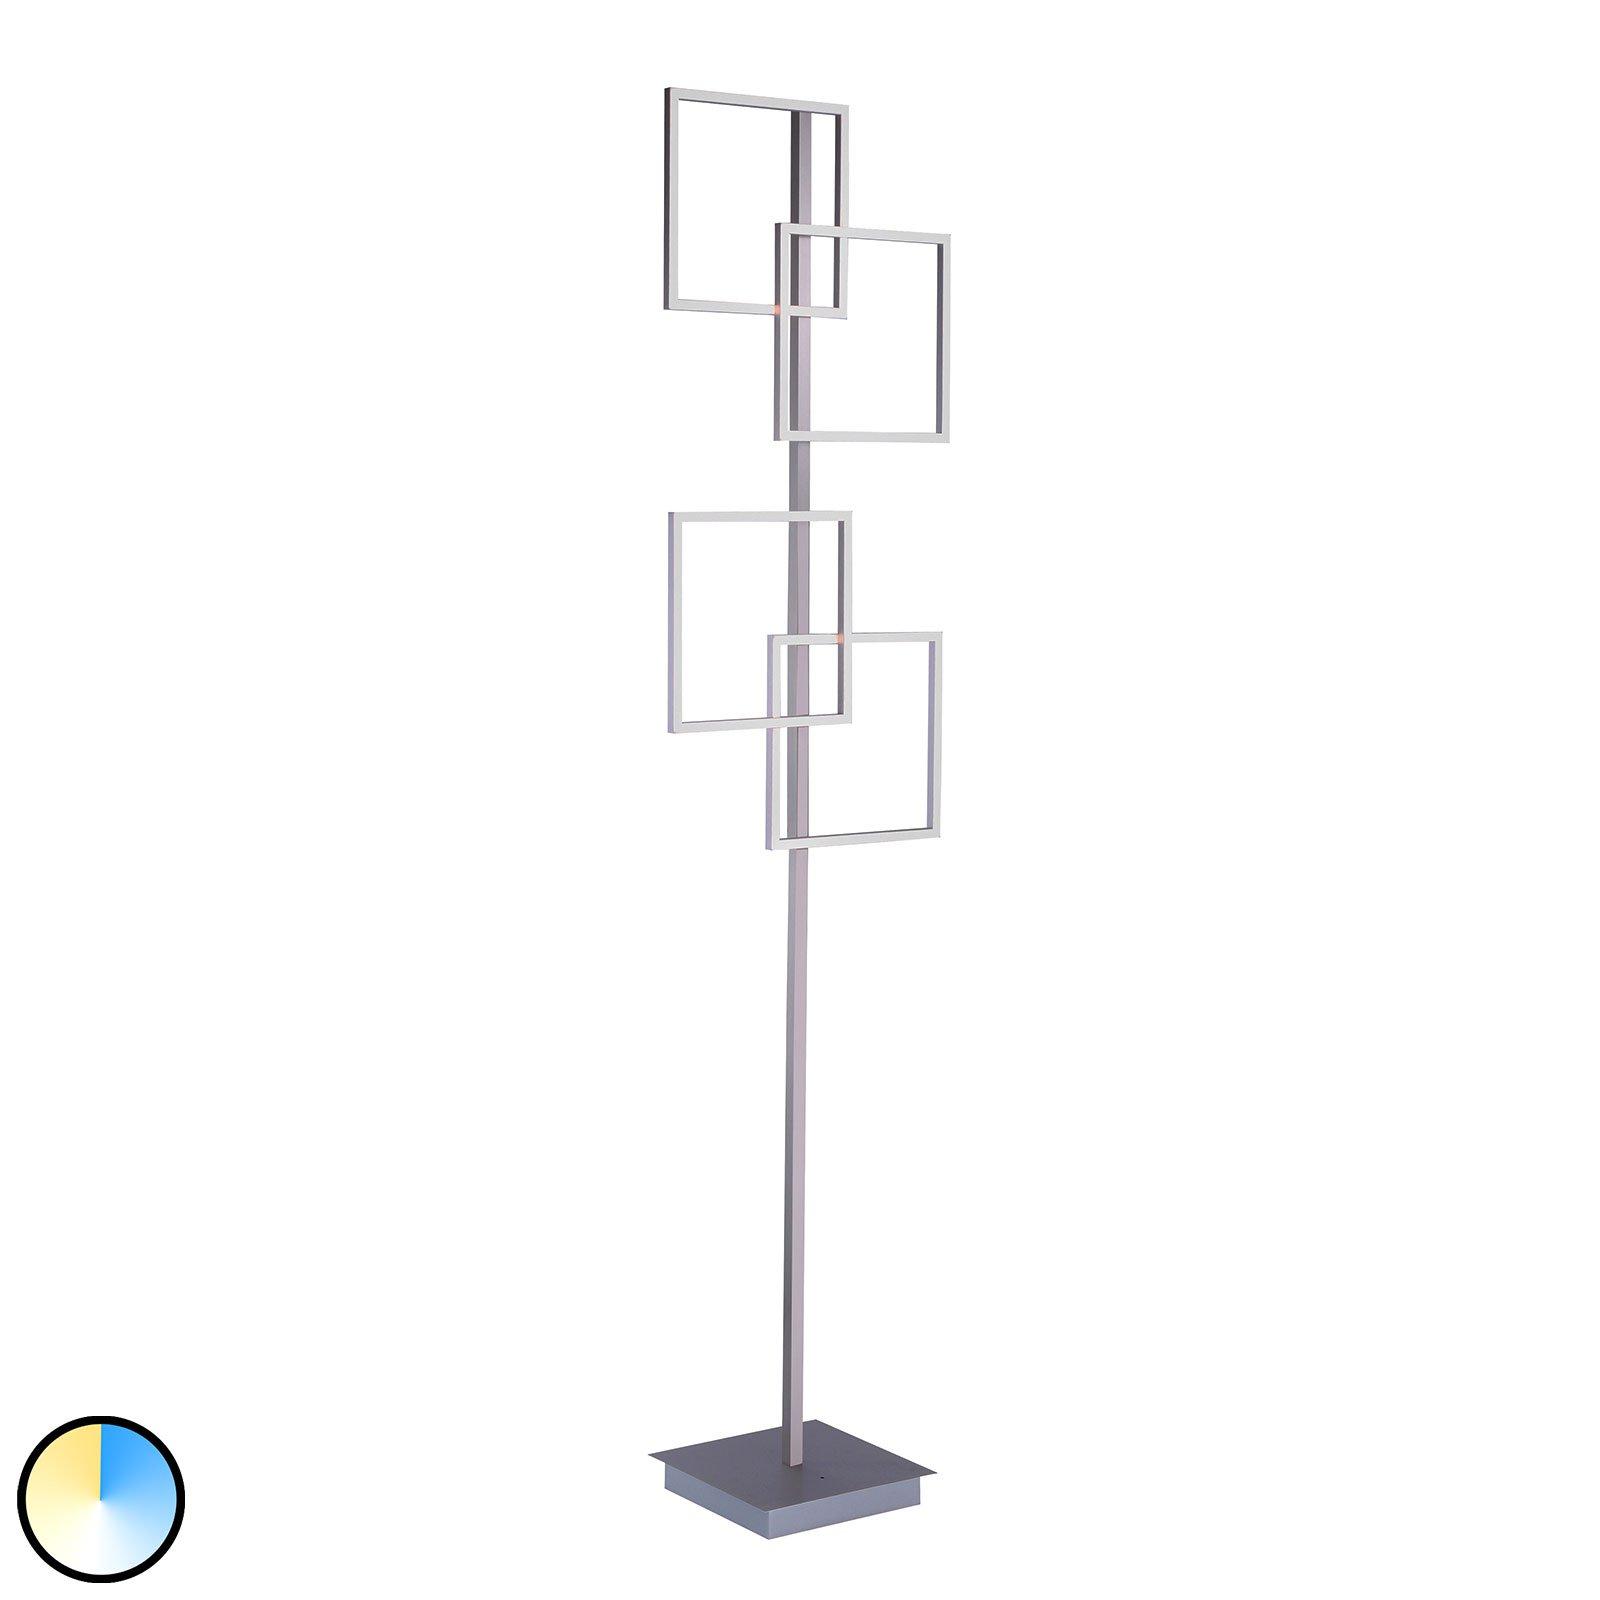 Paul Neuhaus Inigo CCT LED-gulvlampe, 4 lyskilder